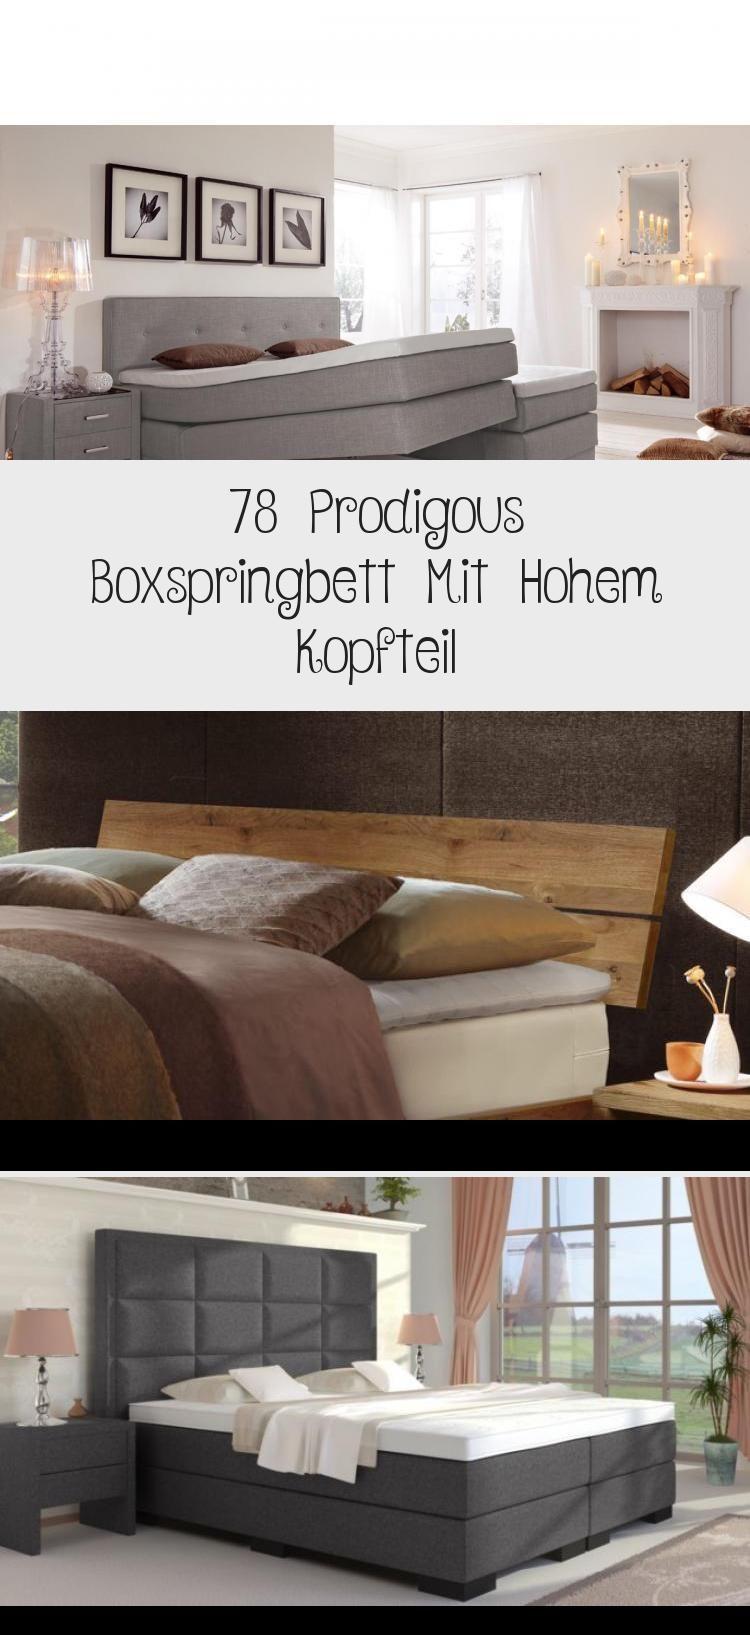 78 Prodigous Boxspringbett Mit Hohem Kopfteil